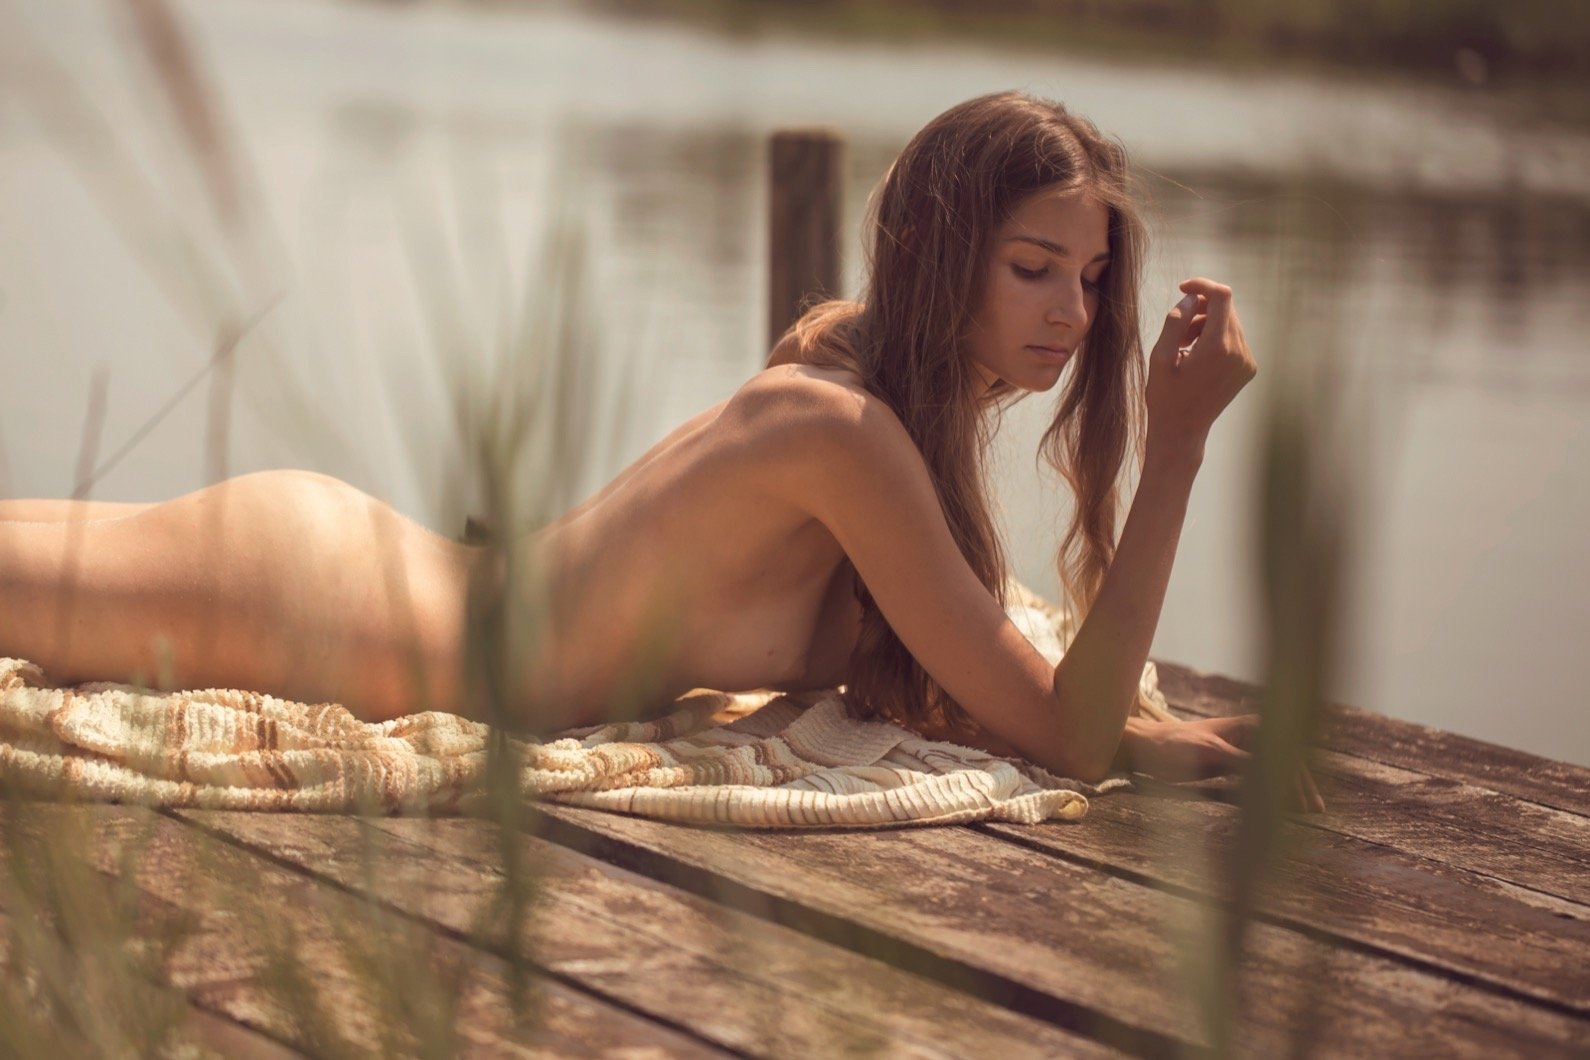 Lina lorenza nude pics naked (59 photos), Fappening Celebrites foto